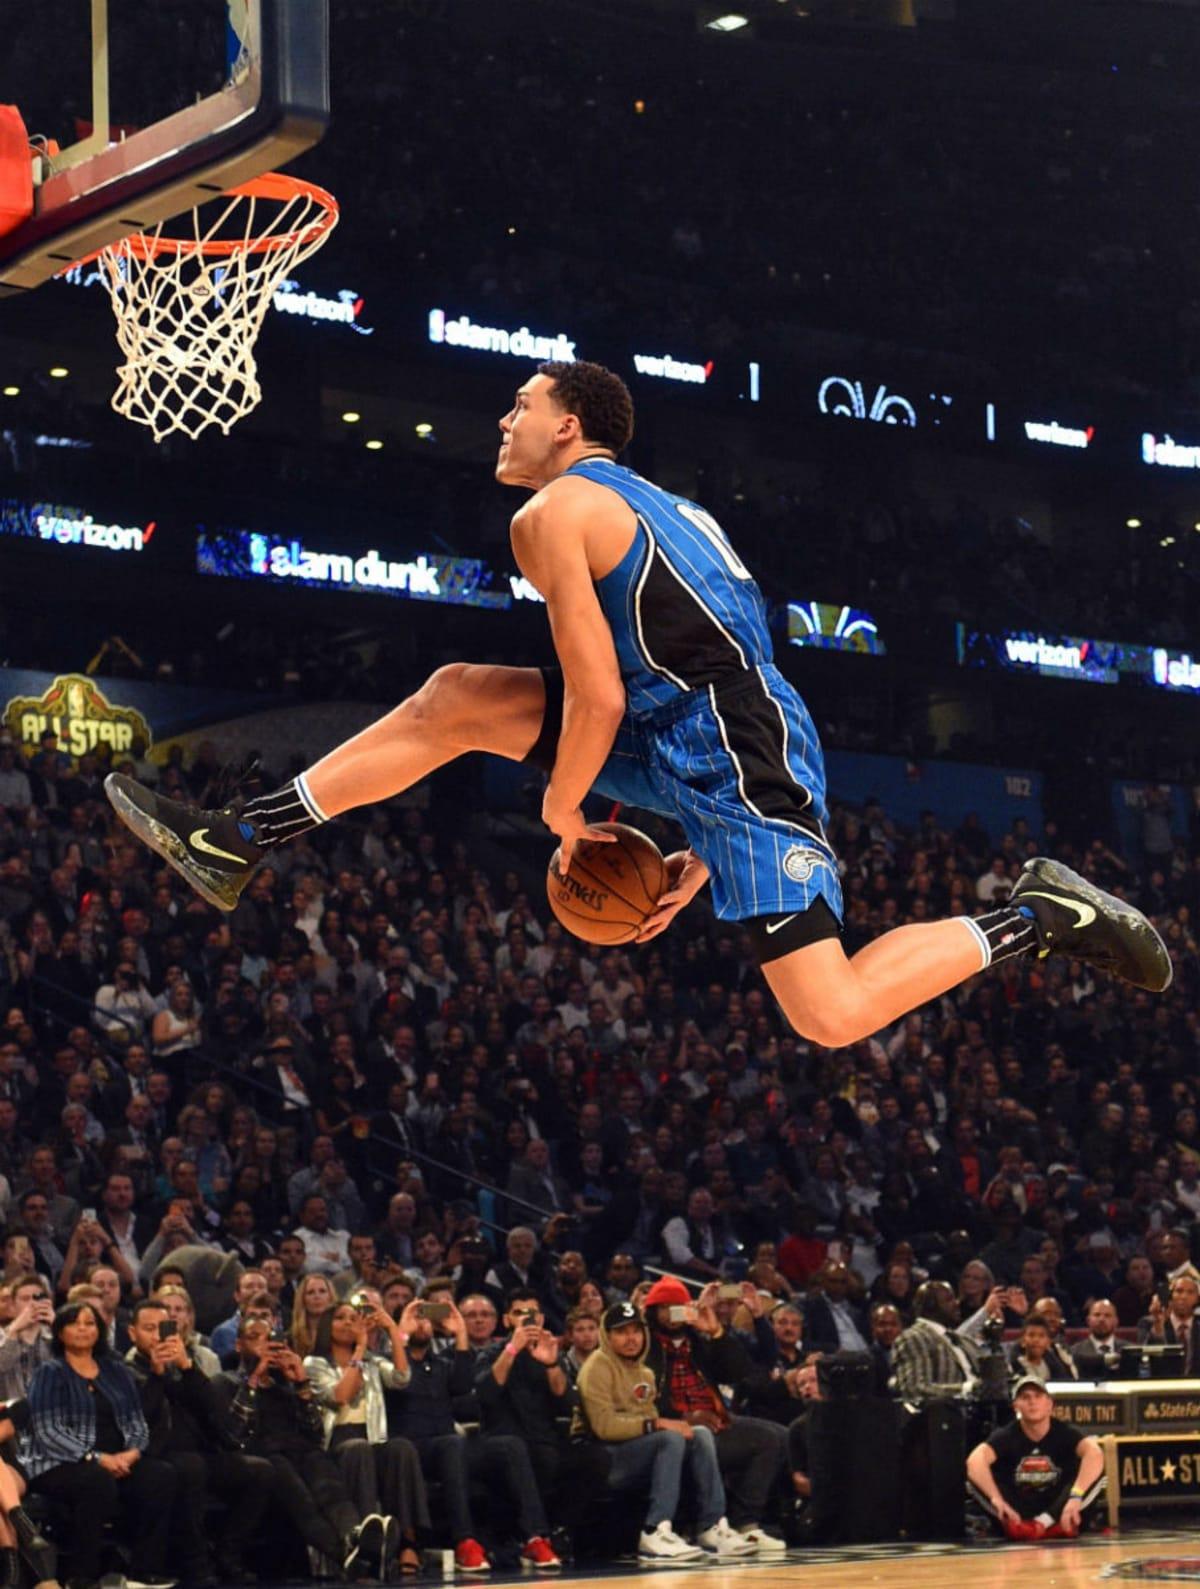 579664018fee Glenn Robinson III Li-Ning Way of Wade 5 Night Crawler - NBA All-Star  Saturday Night Sneakers 2017 Dunk Contest Three-Point Contest Skills  Challenge